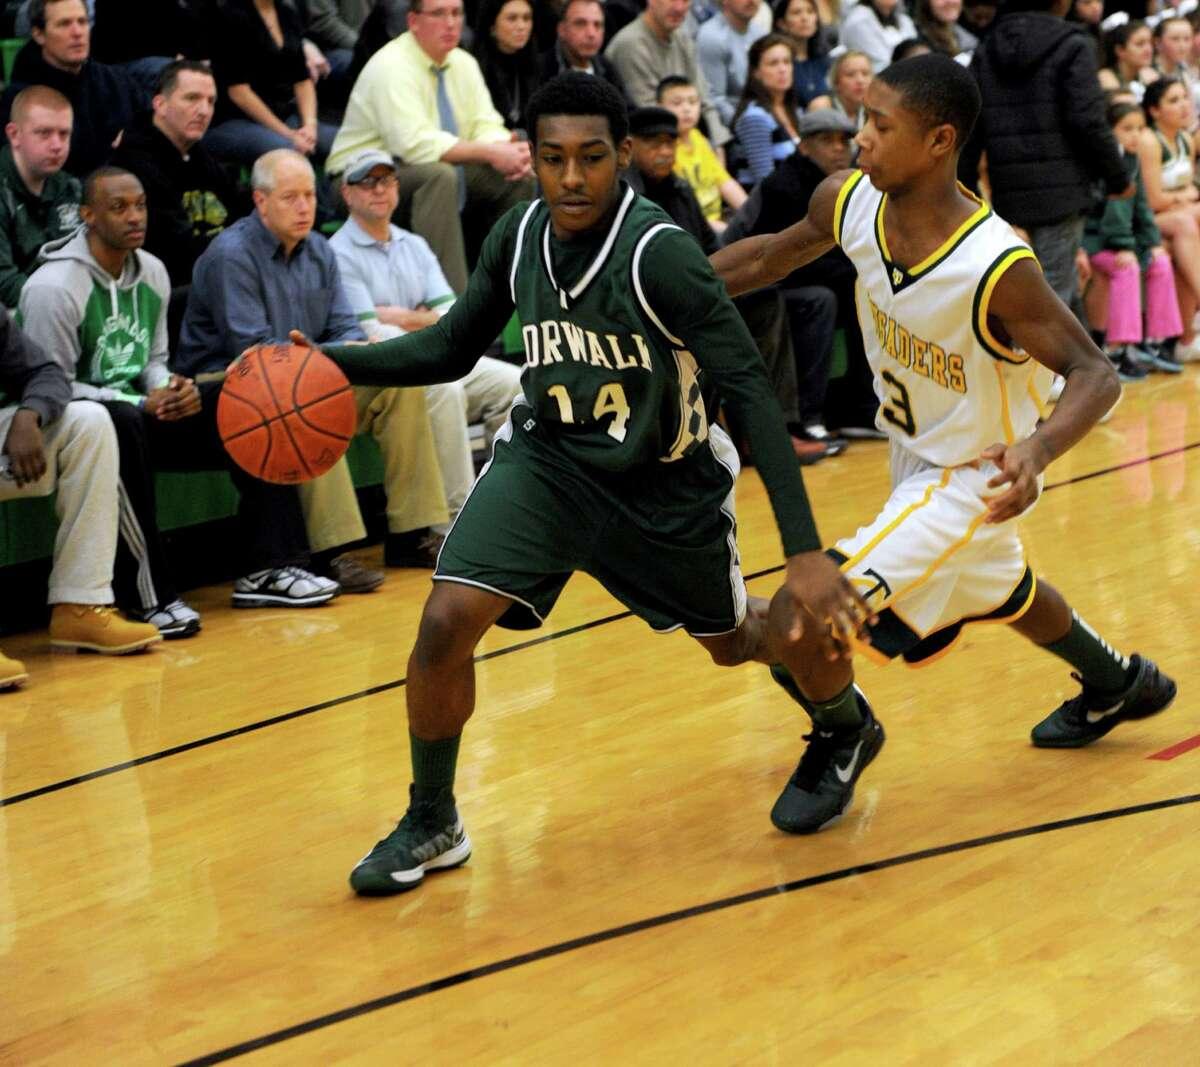 Norwalk's Jabari Dear controls the ball during Friday's boys basketball game at Trinity Catholic High School in Stamford on December 21, 2012.